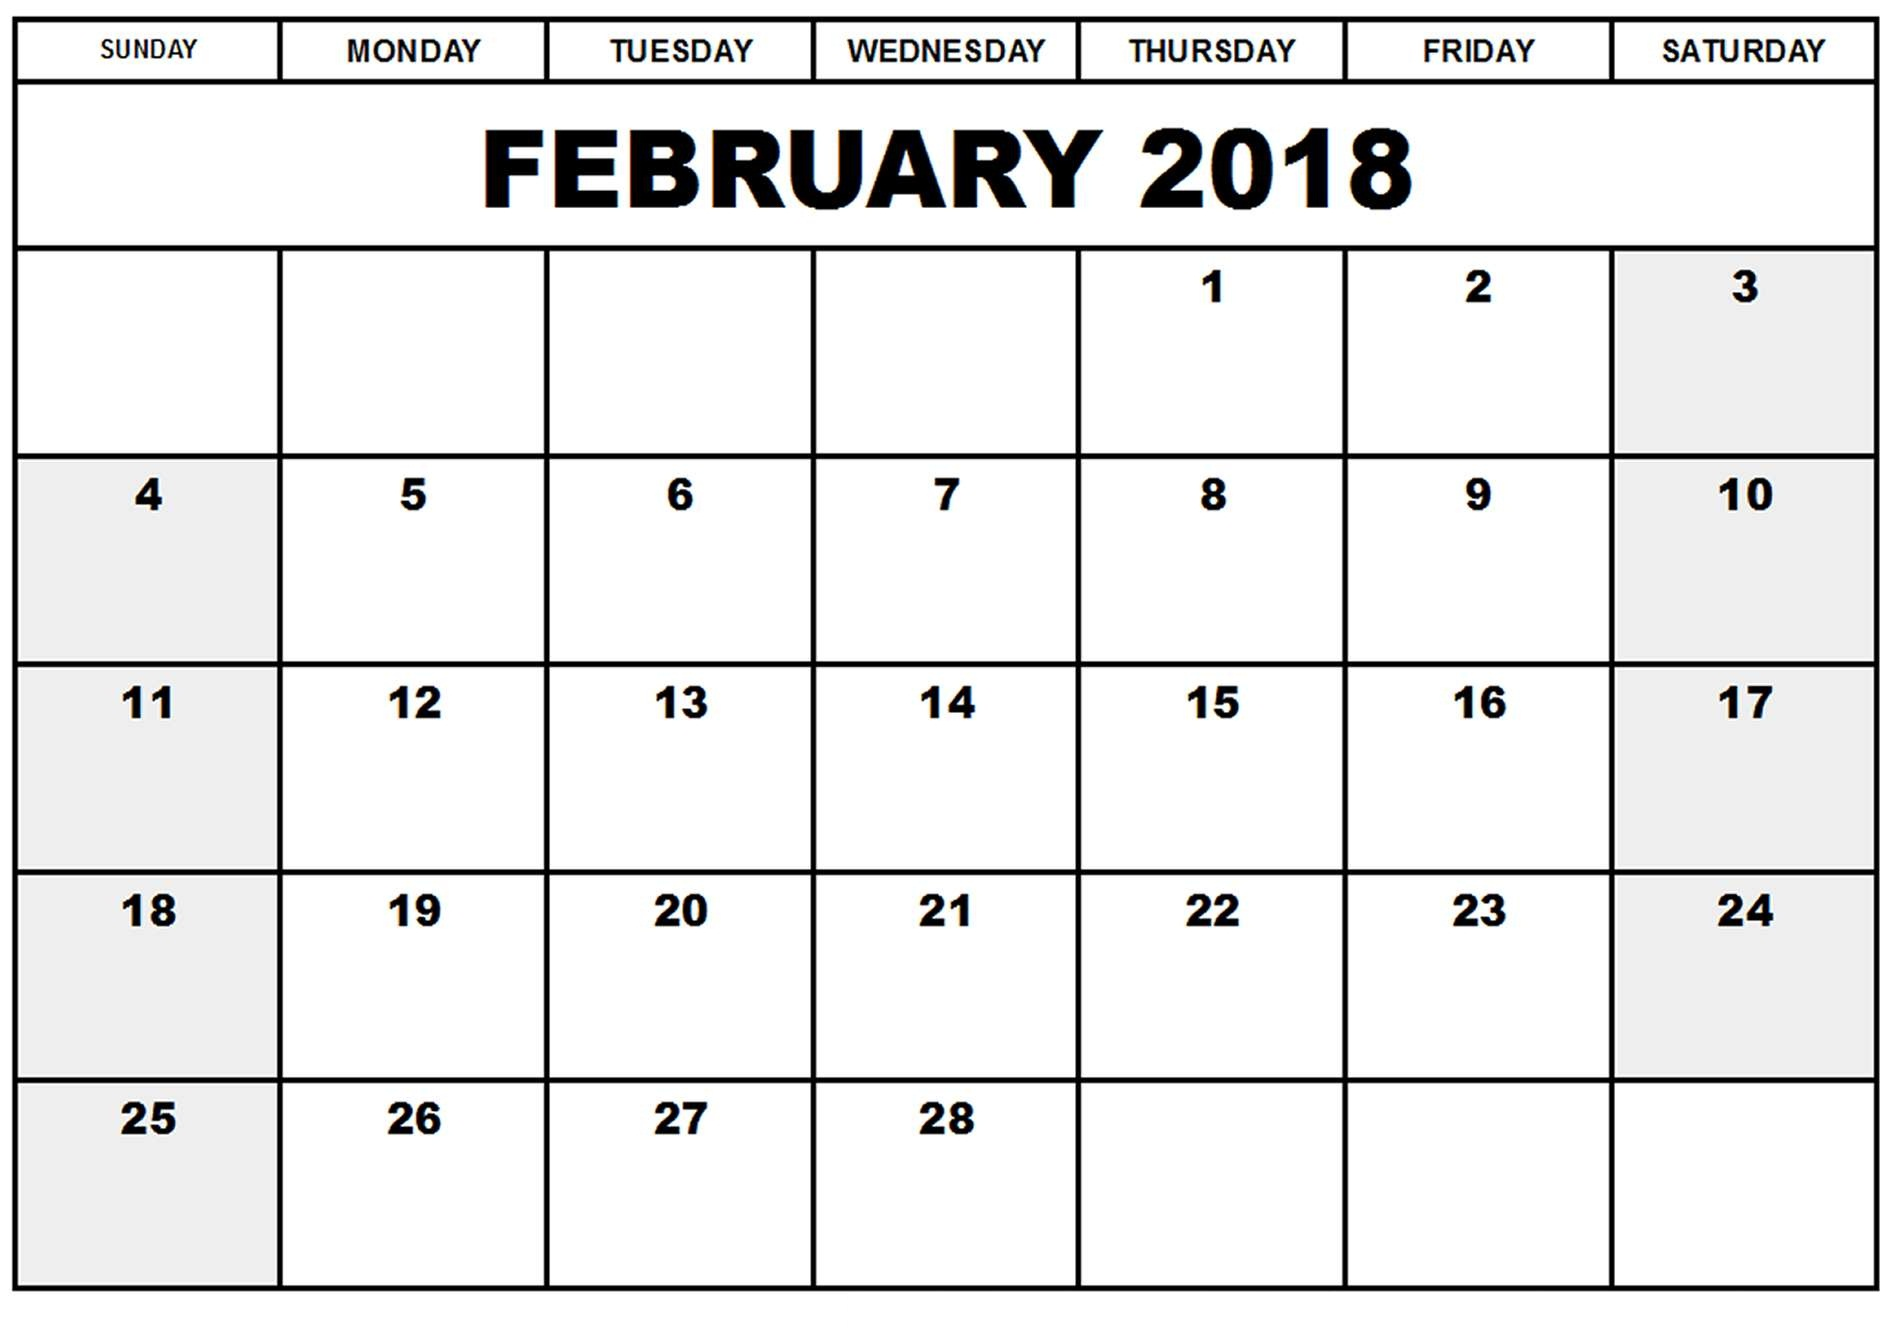 February 2018 Calendar Pdf Word Excel Template 1890x1336